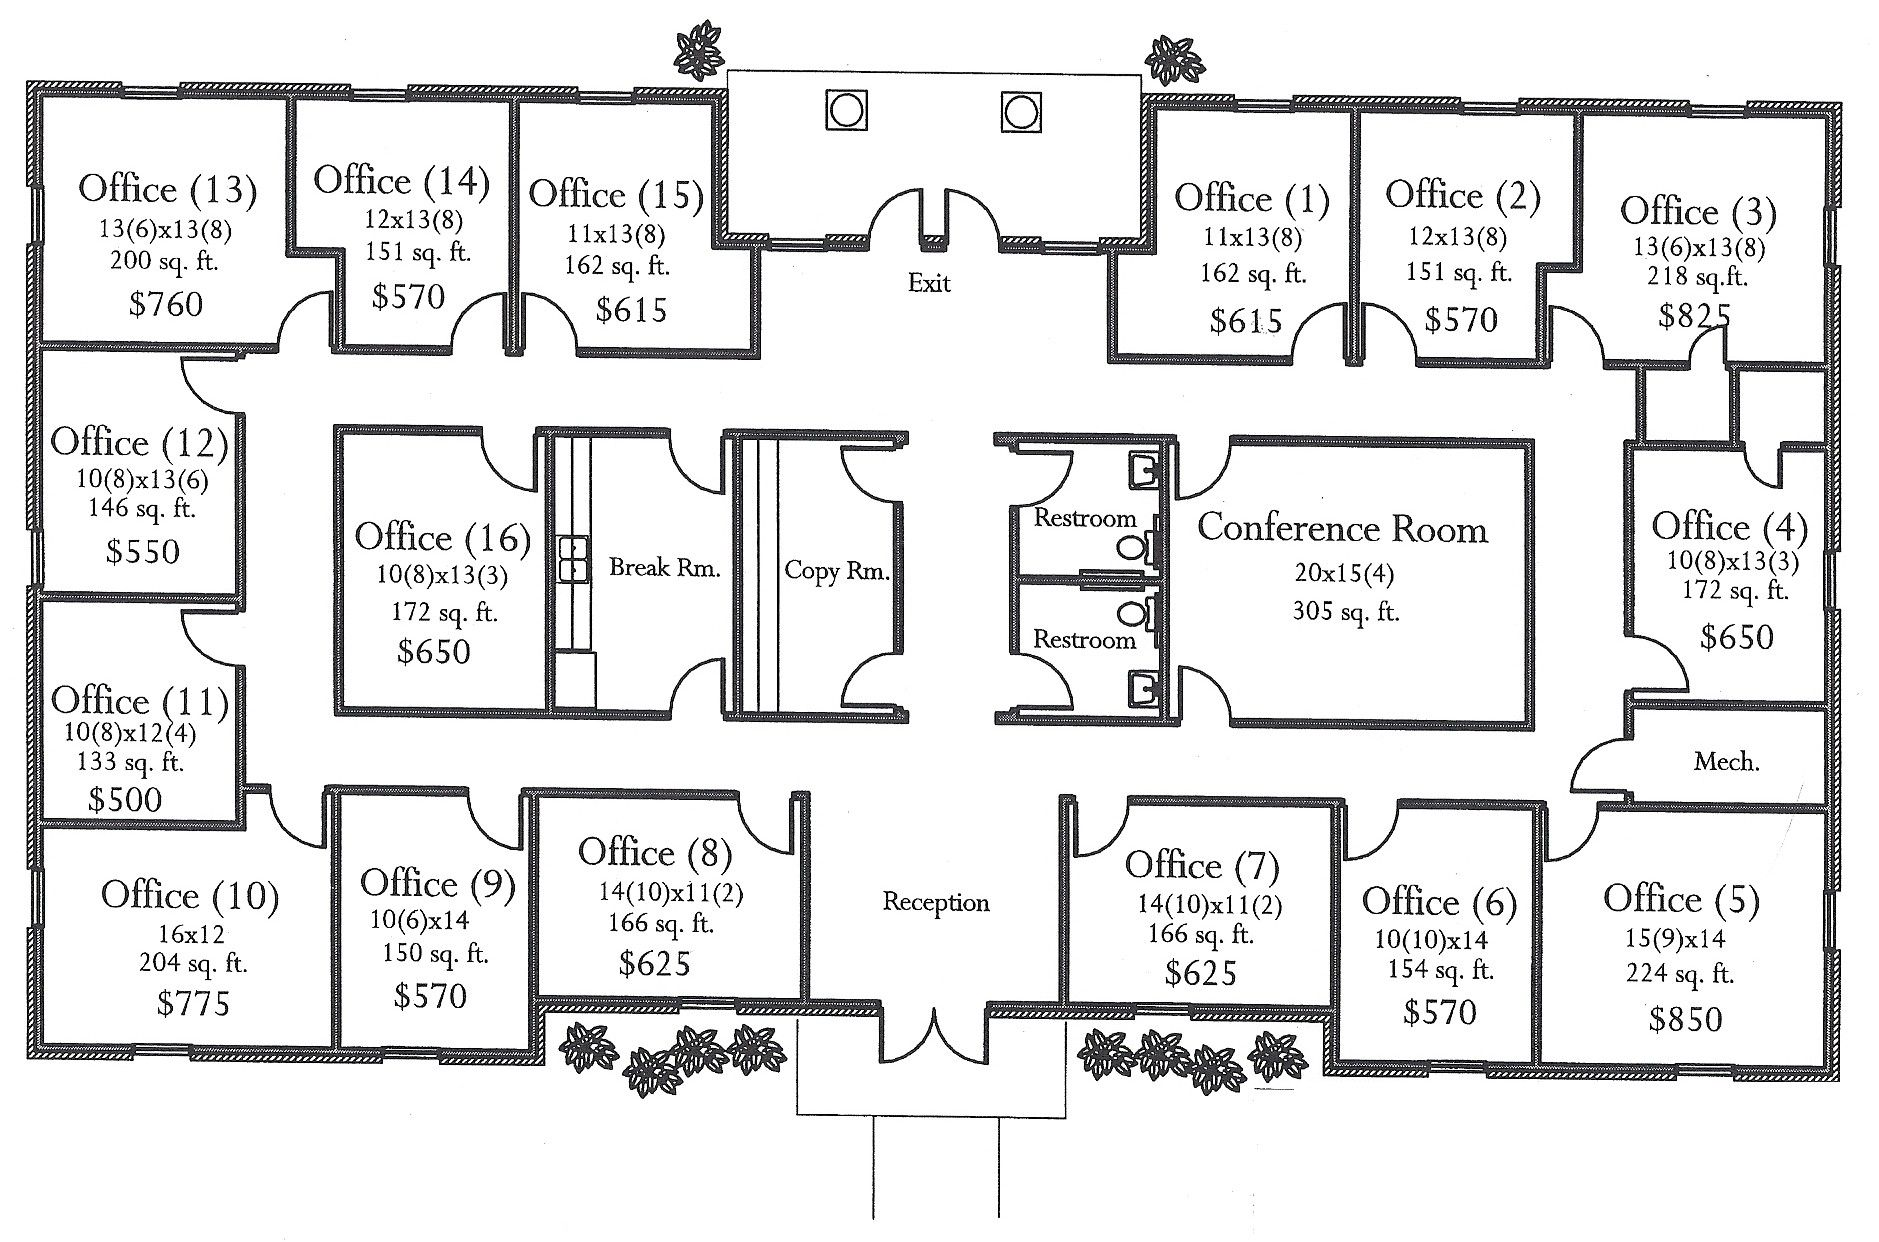 Office Building Floor Plans Examples | Atcsagacity.com